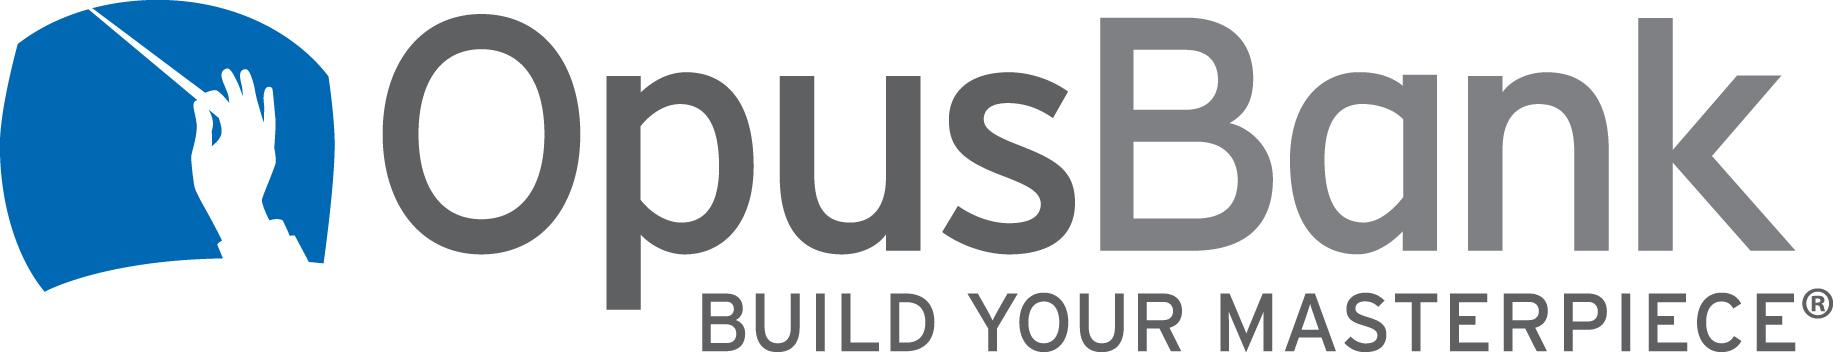 Opus Bank logo